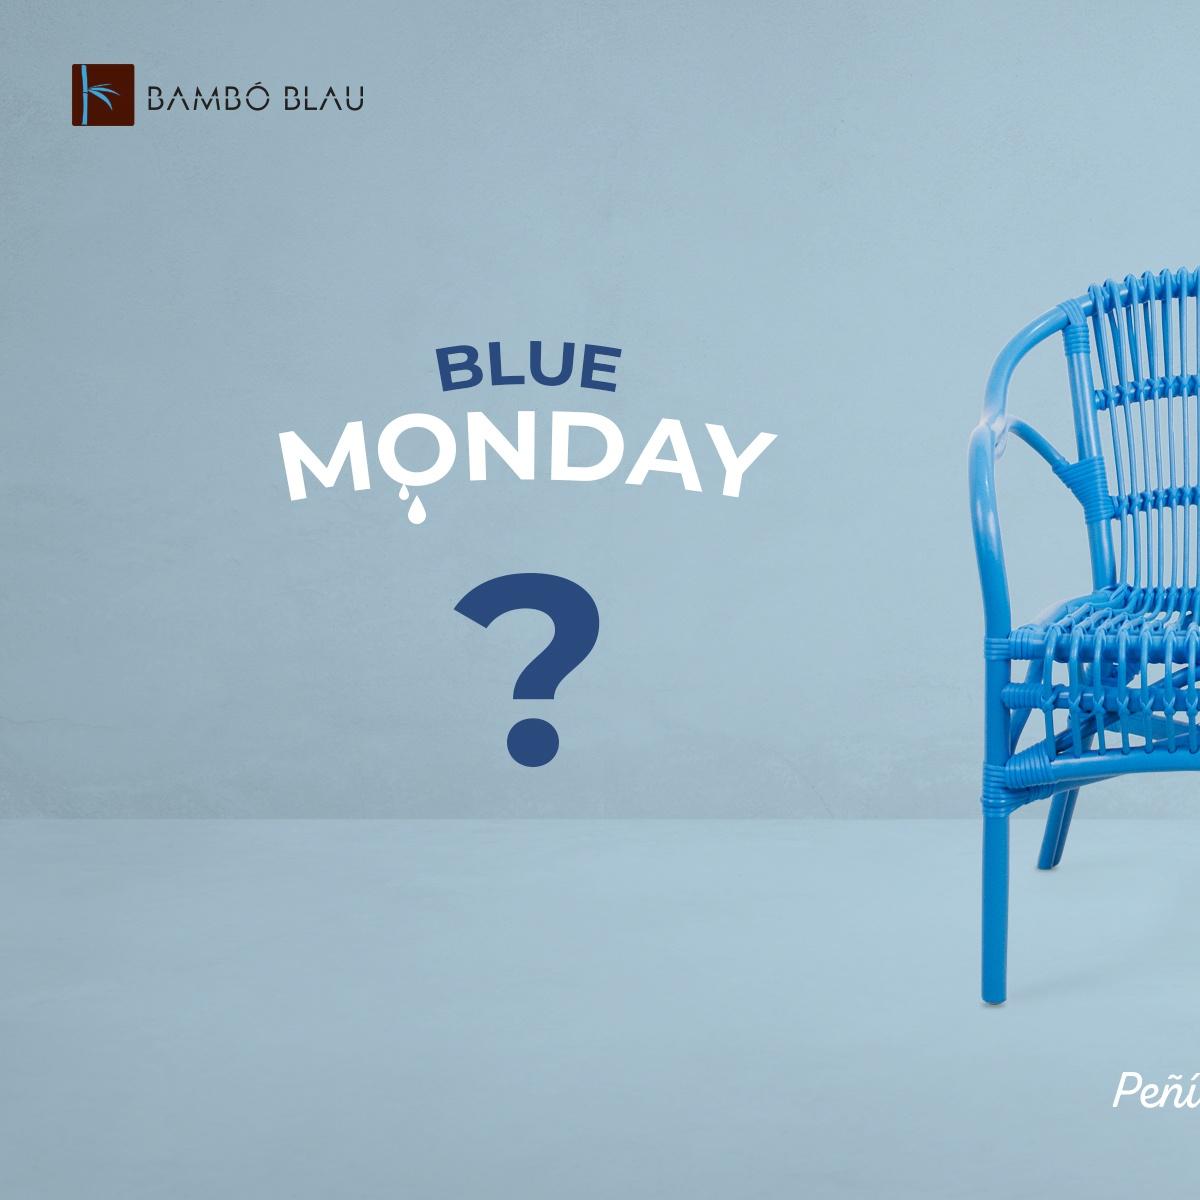 Blue Monday by Bambó Blau